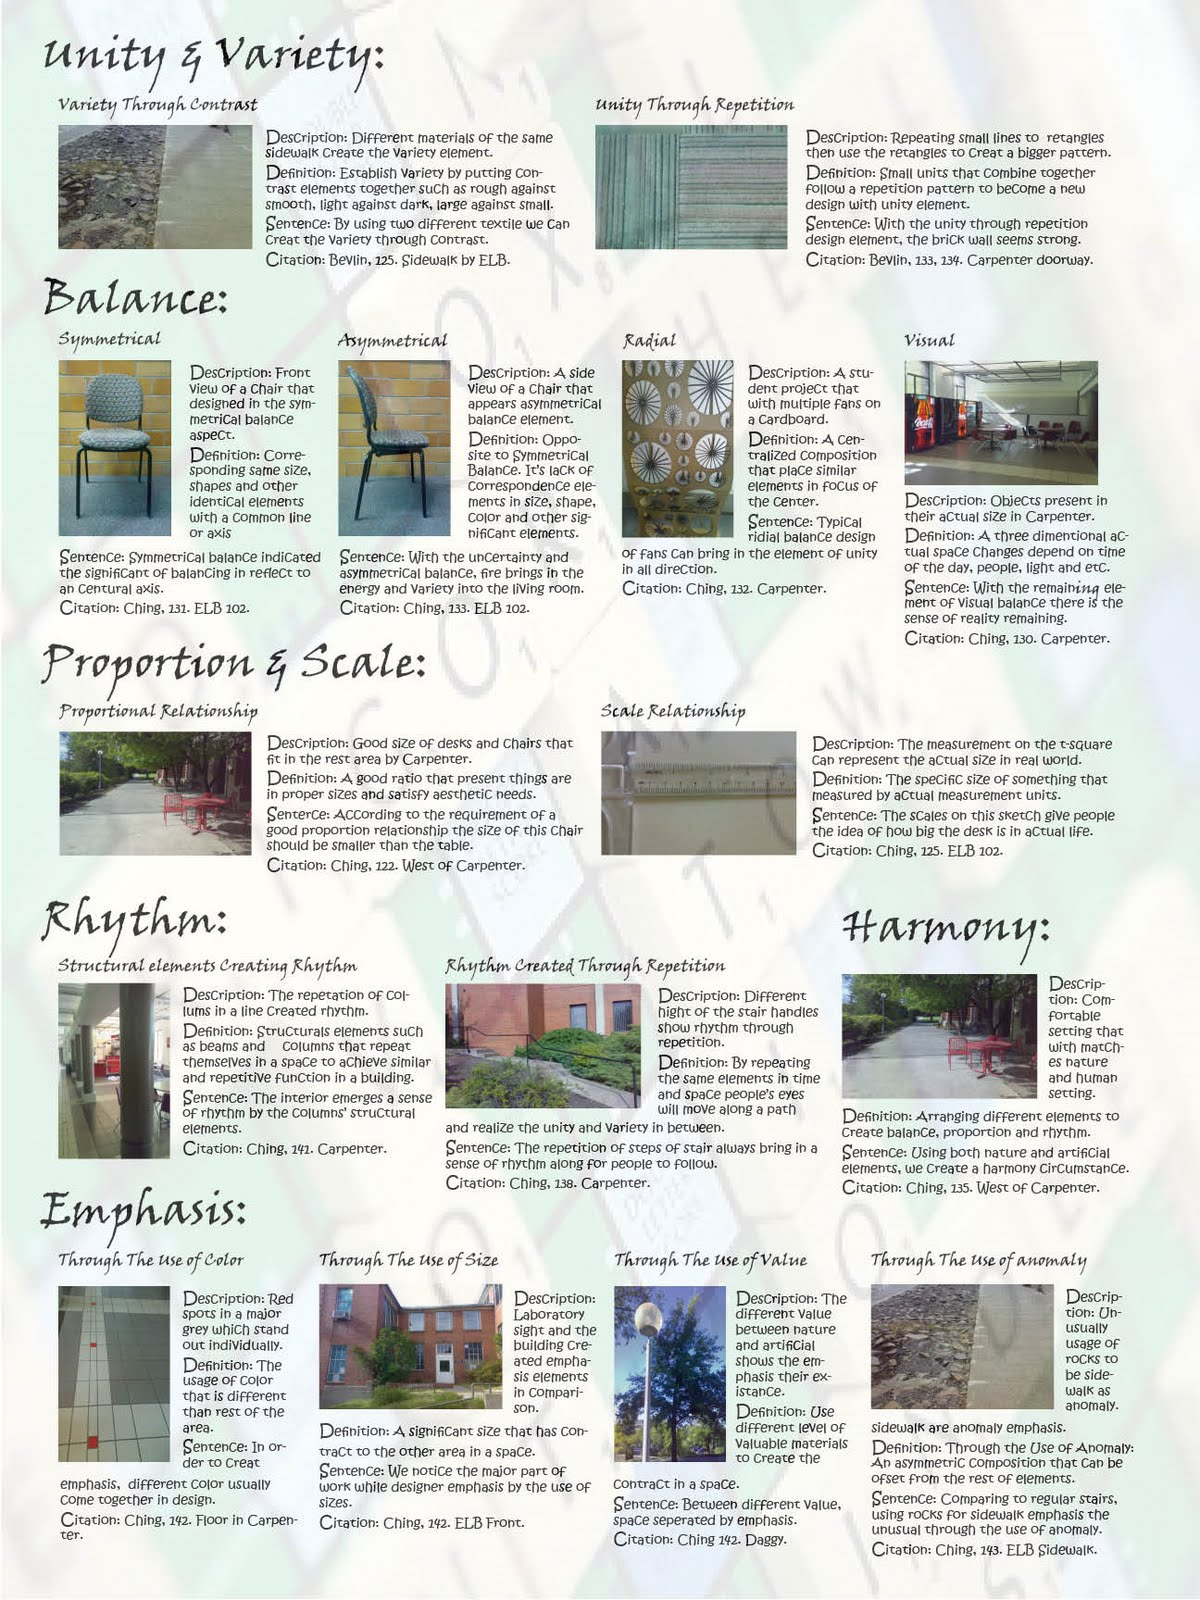 123 analyzing elements principle of design on campus - Elements And Principles Of Interior Design